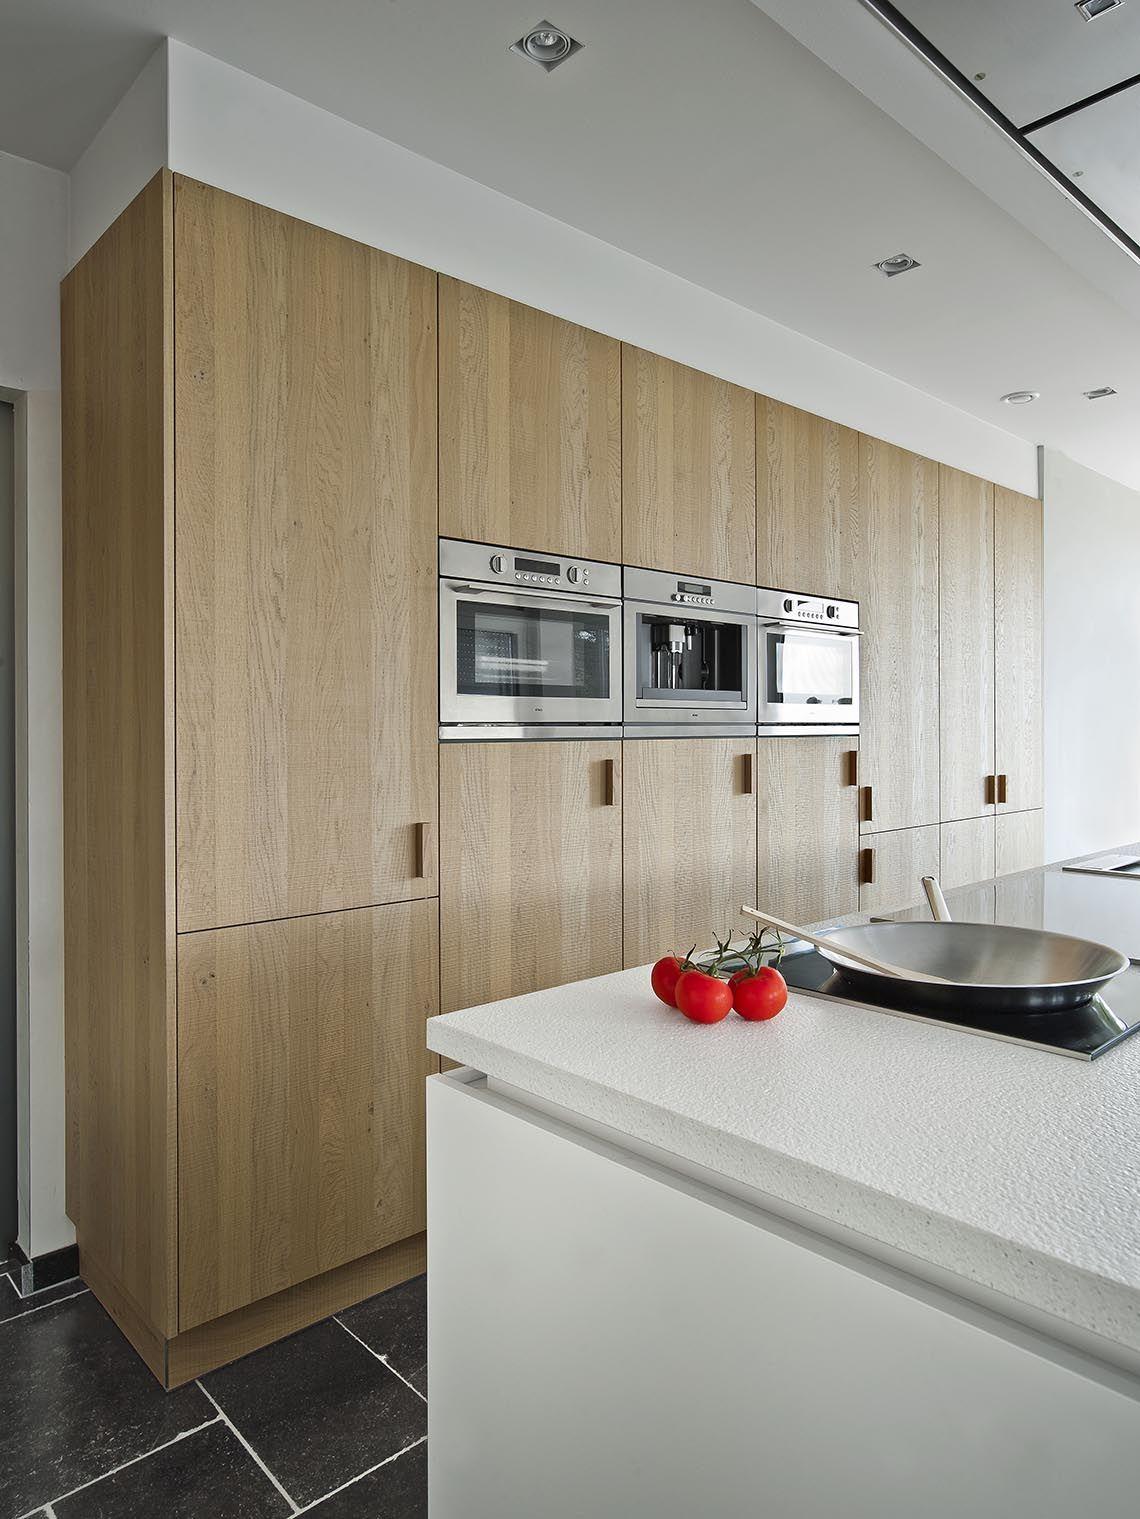 Interieur Verkest   Strak wit en hout   Keuken   Luxus Wonen ...